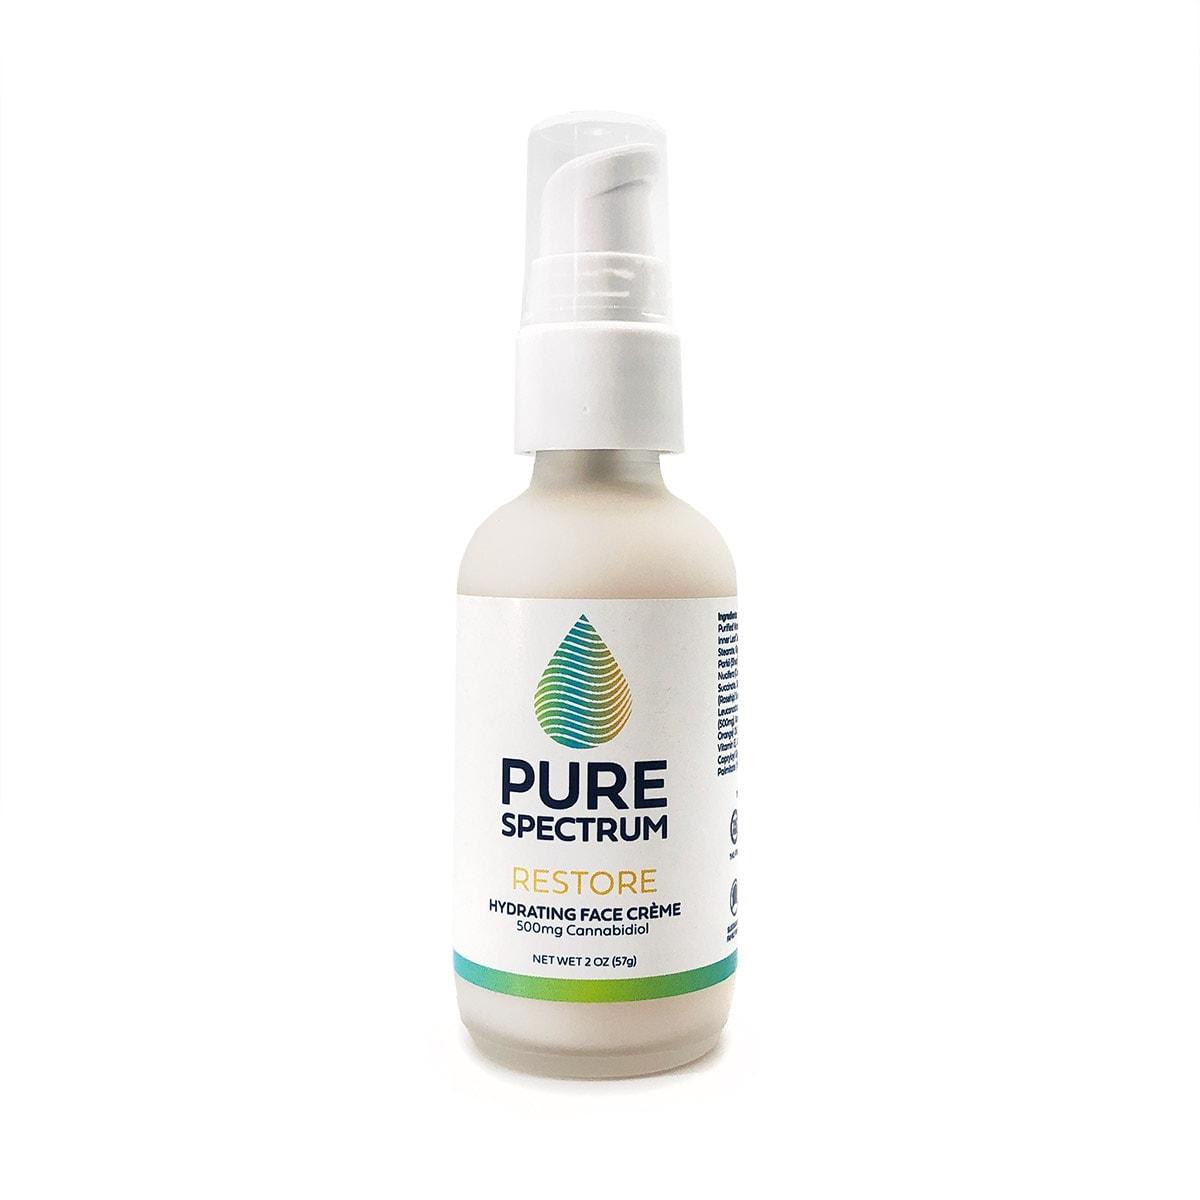 Pure Spectrum, Restore CBD Hydrating Face Creme, 2oz, 500mg of CBD